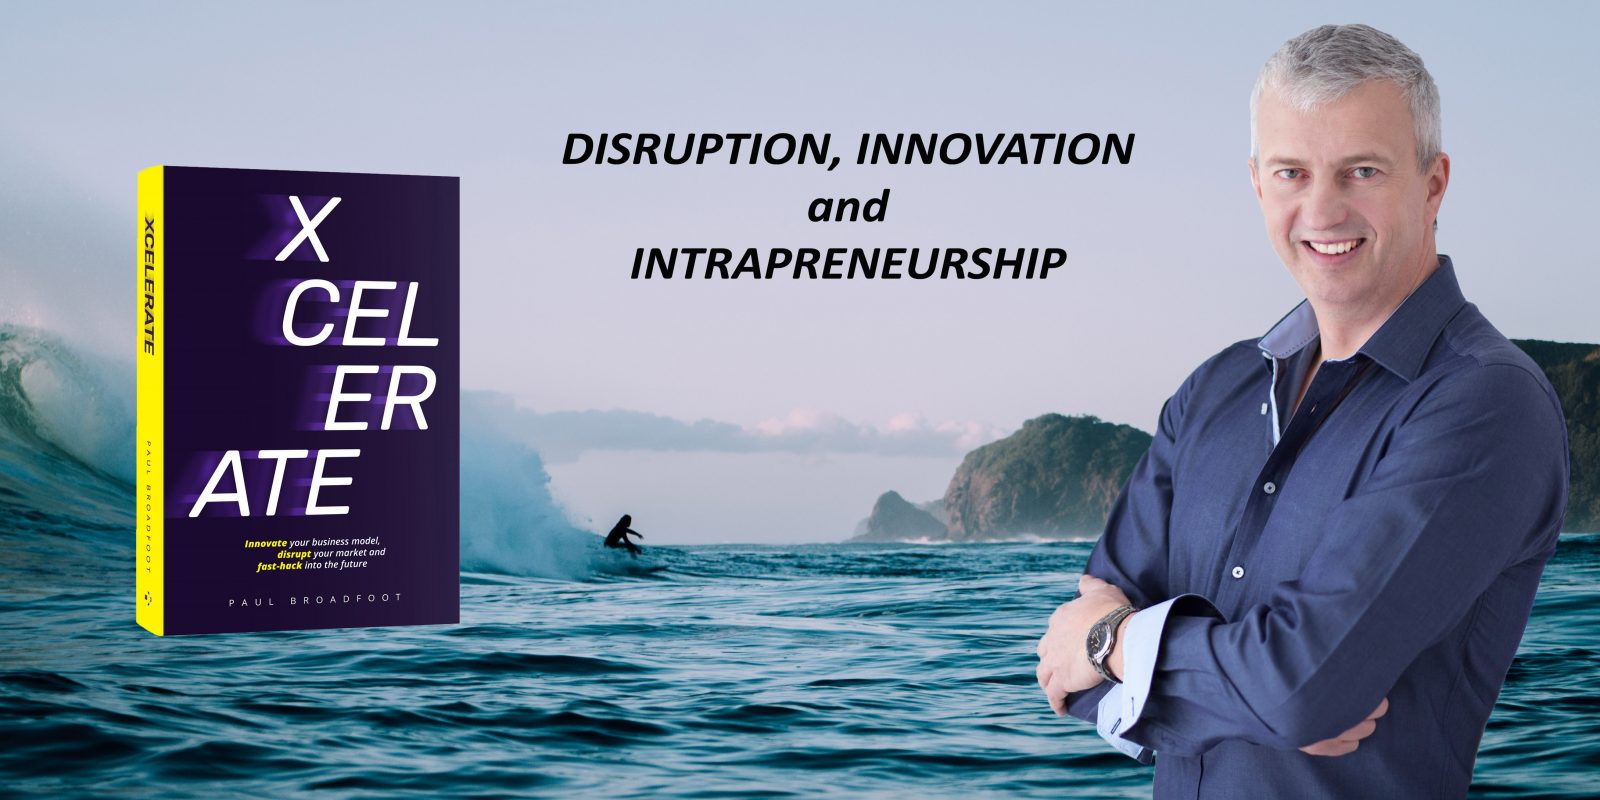 Disruption, Innovation and Intrapreneurship